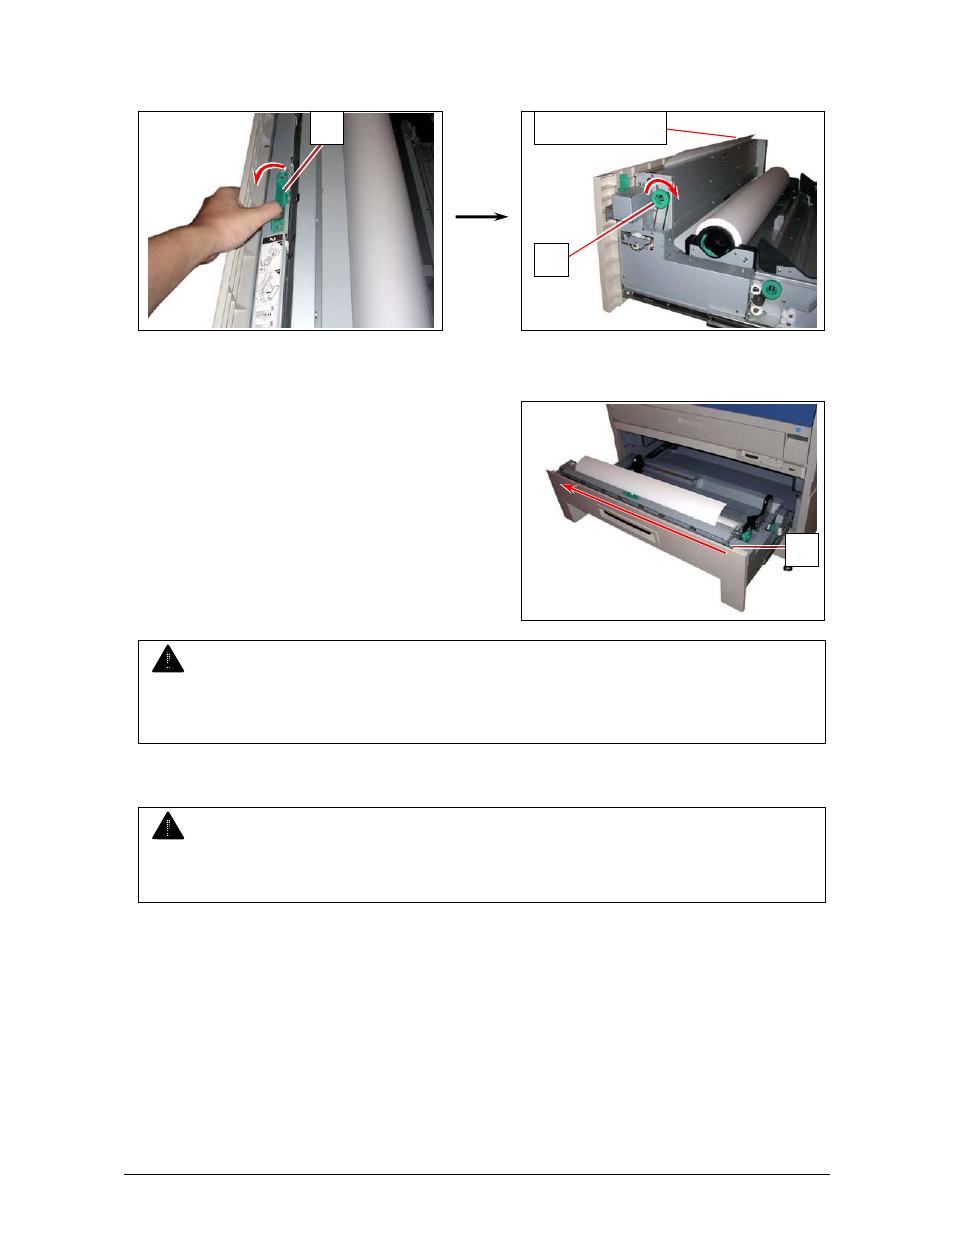 konica minolta kip 3100 user manual page 42 56 rh manualsdir com